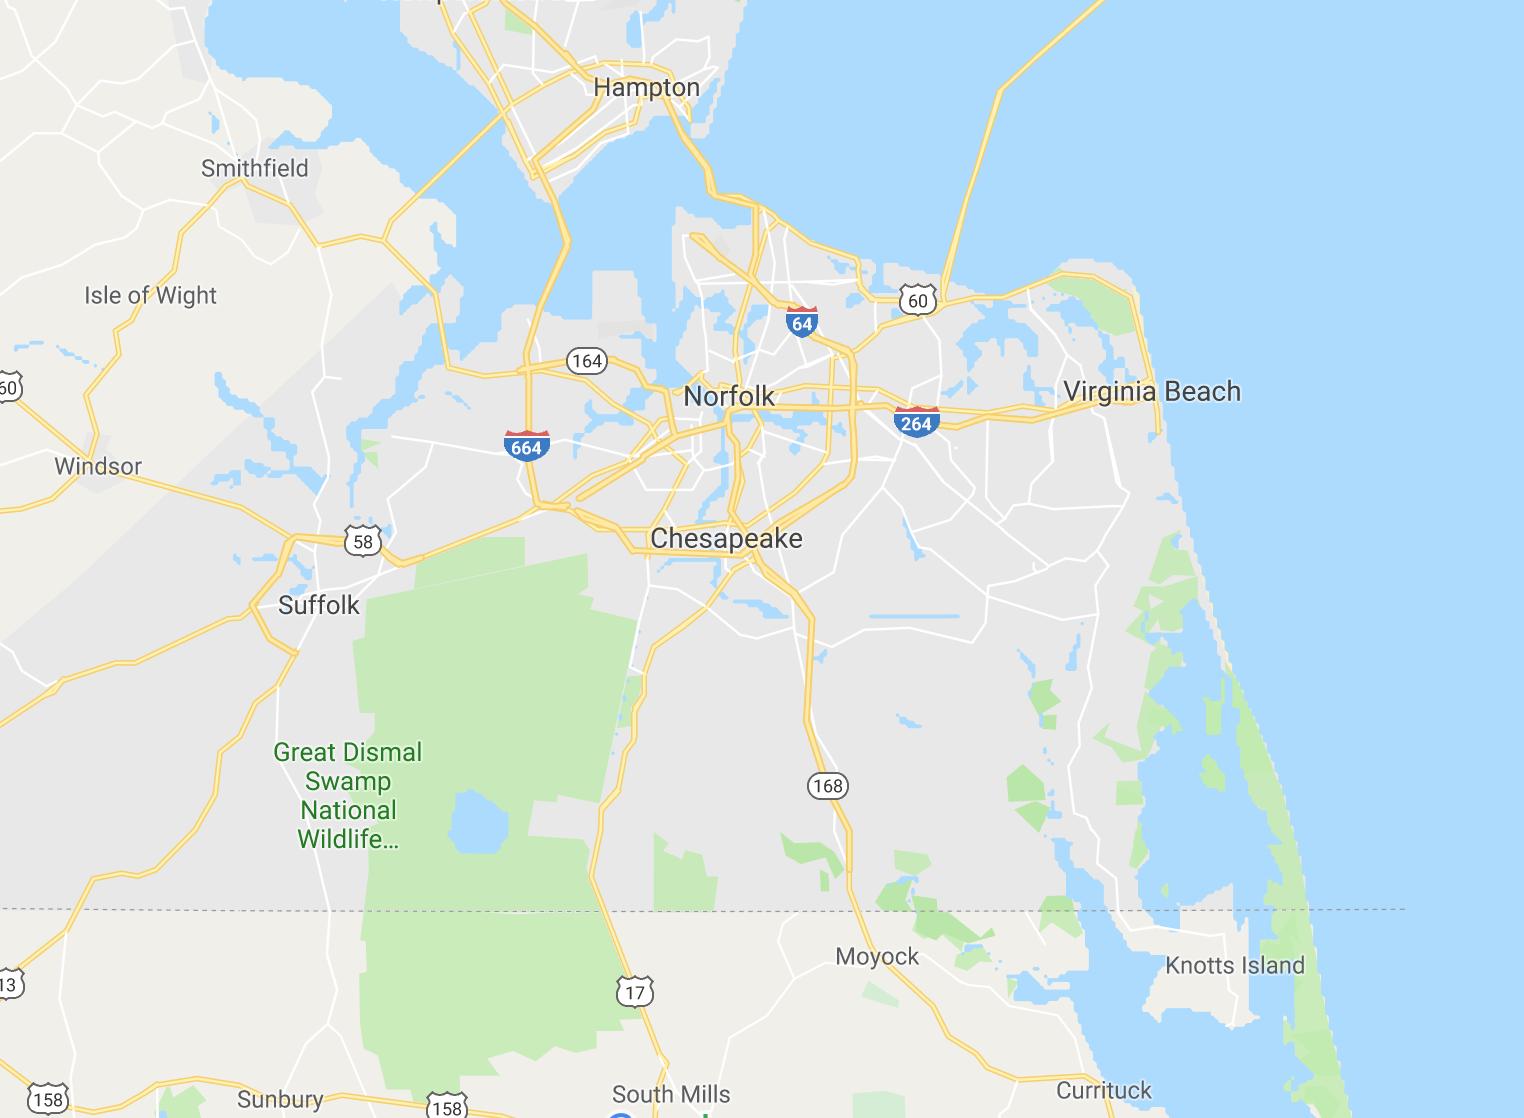 City Worker Kills 12 In Virginia Beach